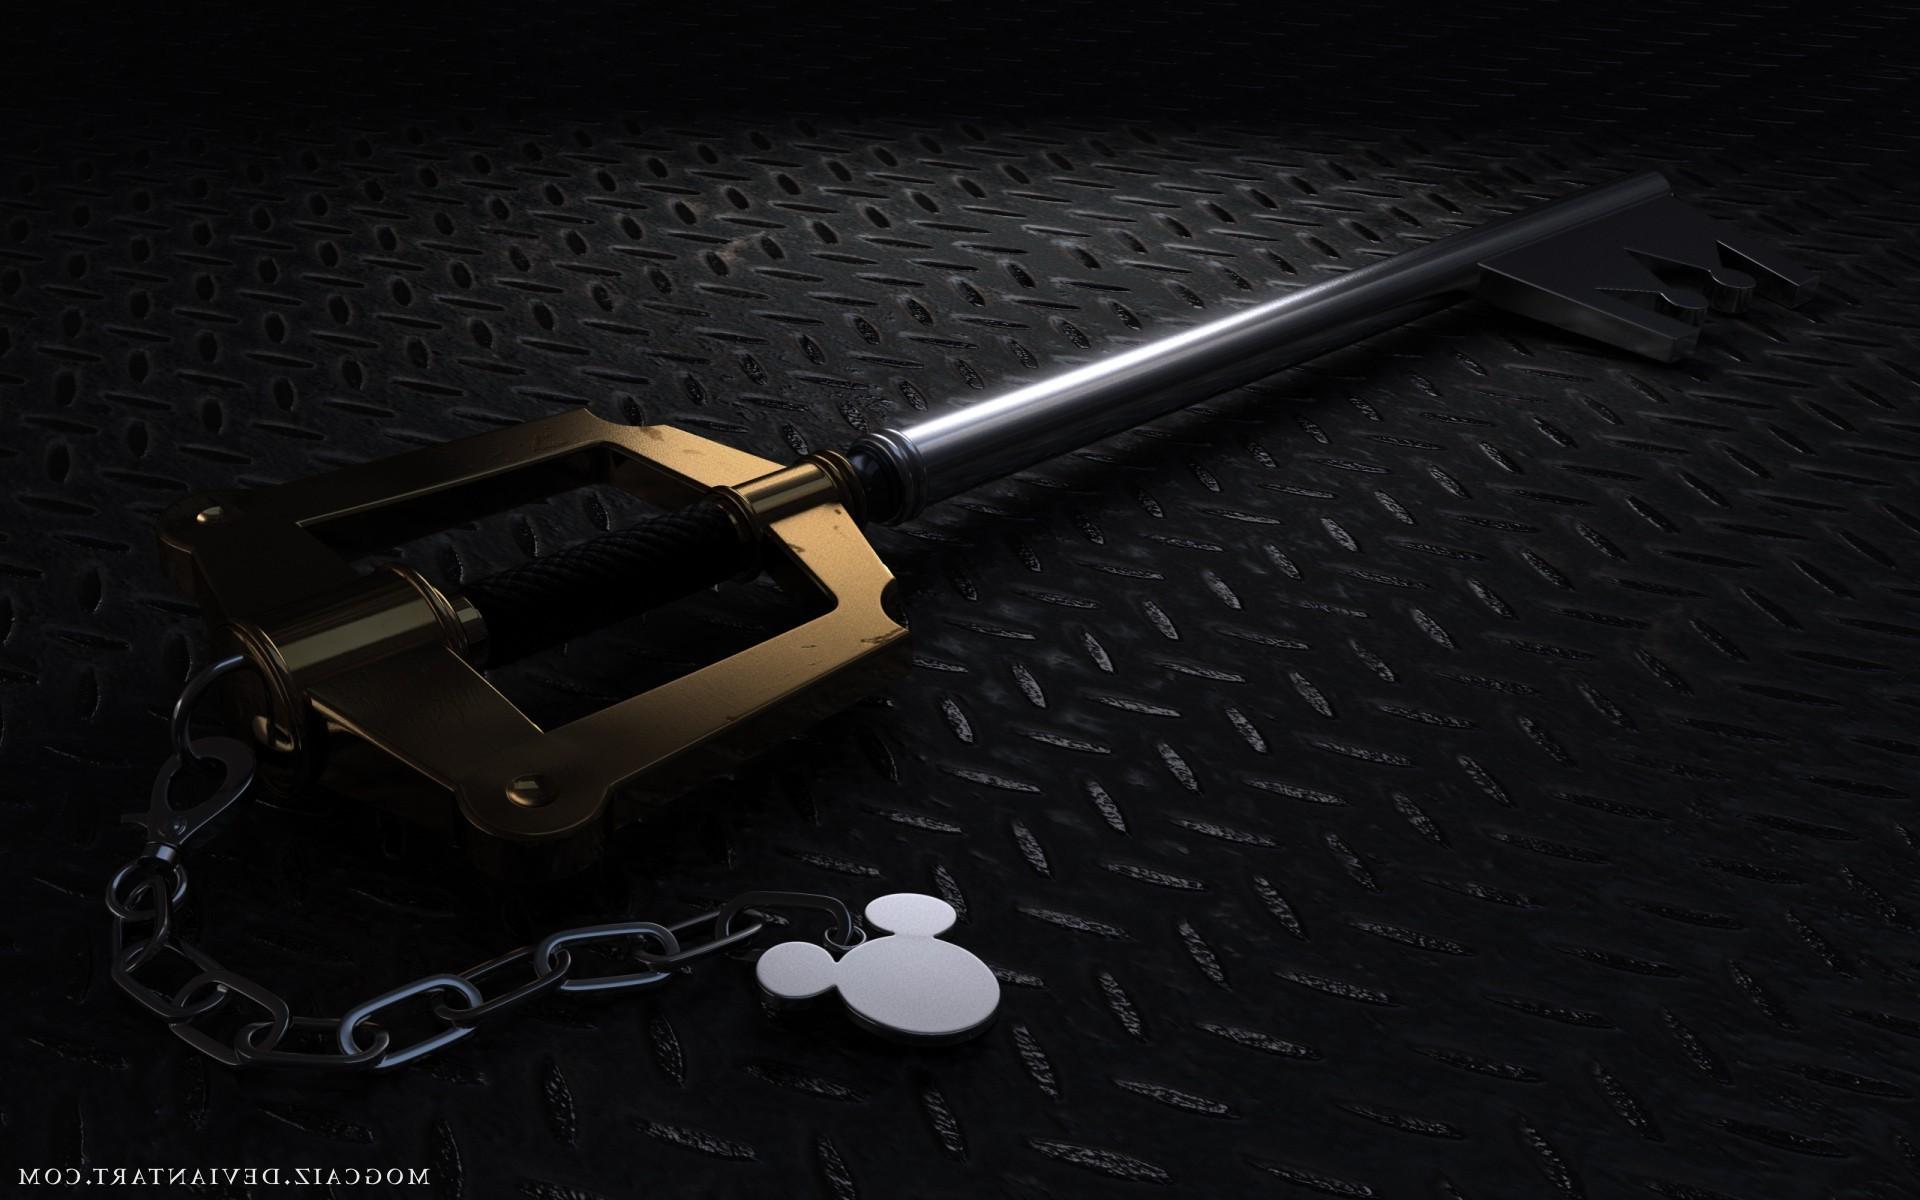 Kingdom Hearts Keyblade Wallpaper